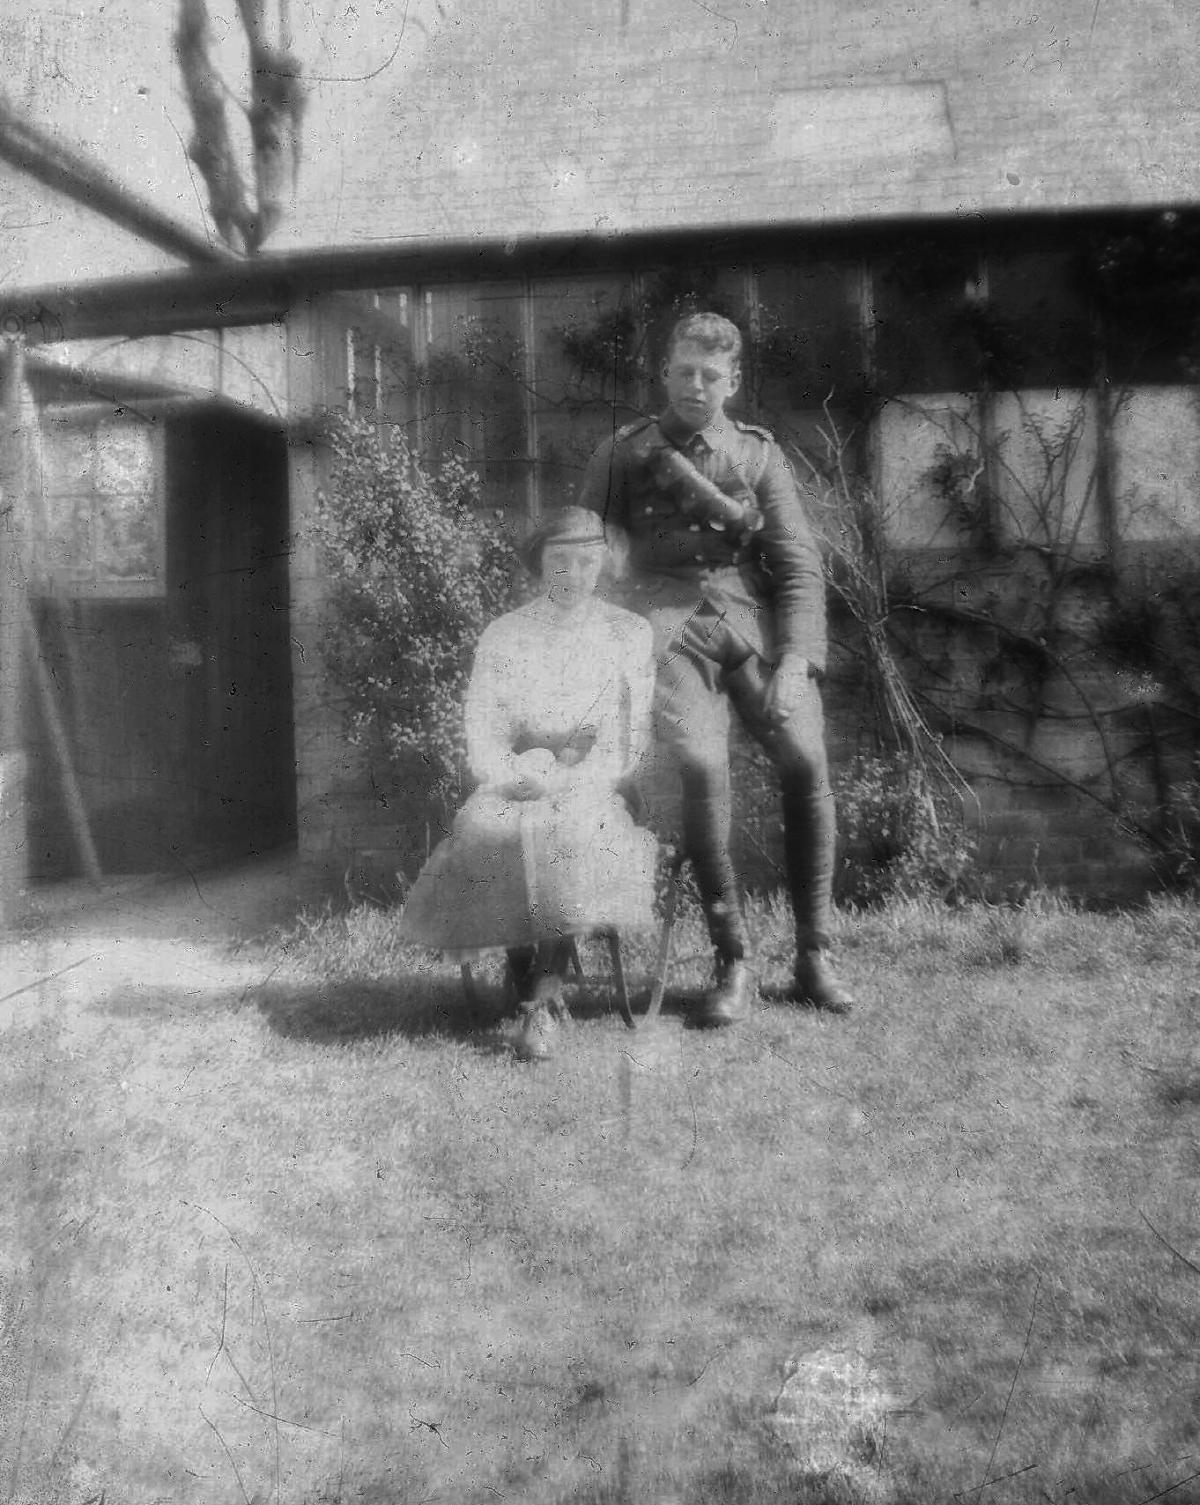 Greg Packs Dusty Box Reveals Haul Of Old Family Photos Echo